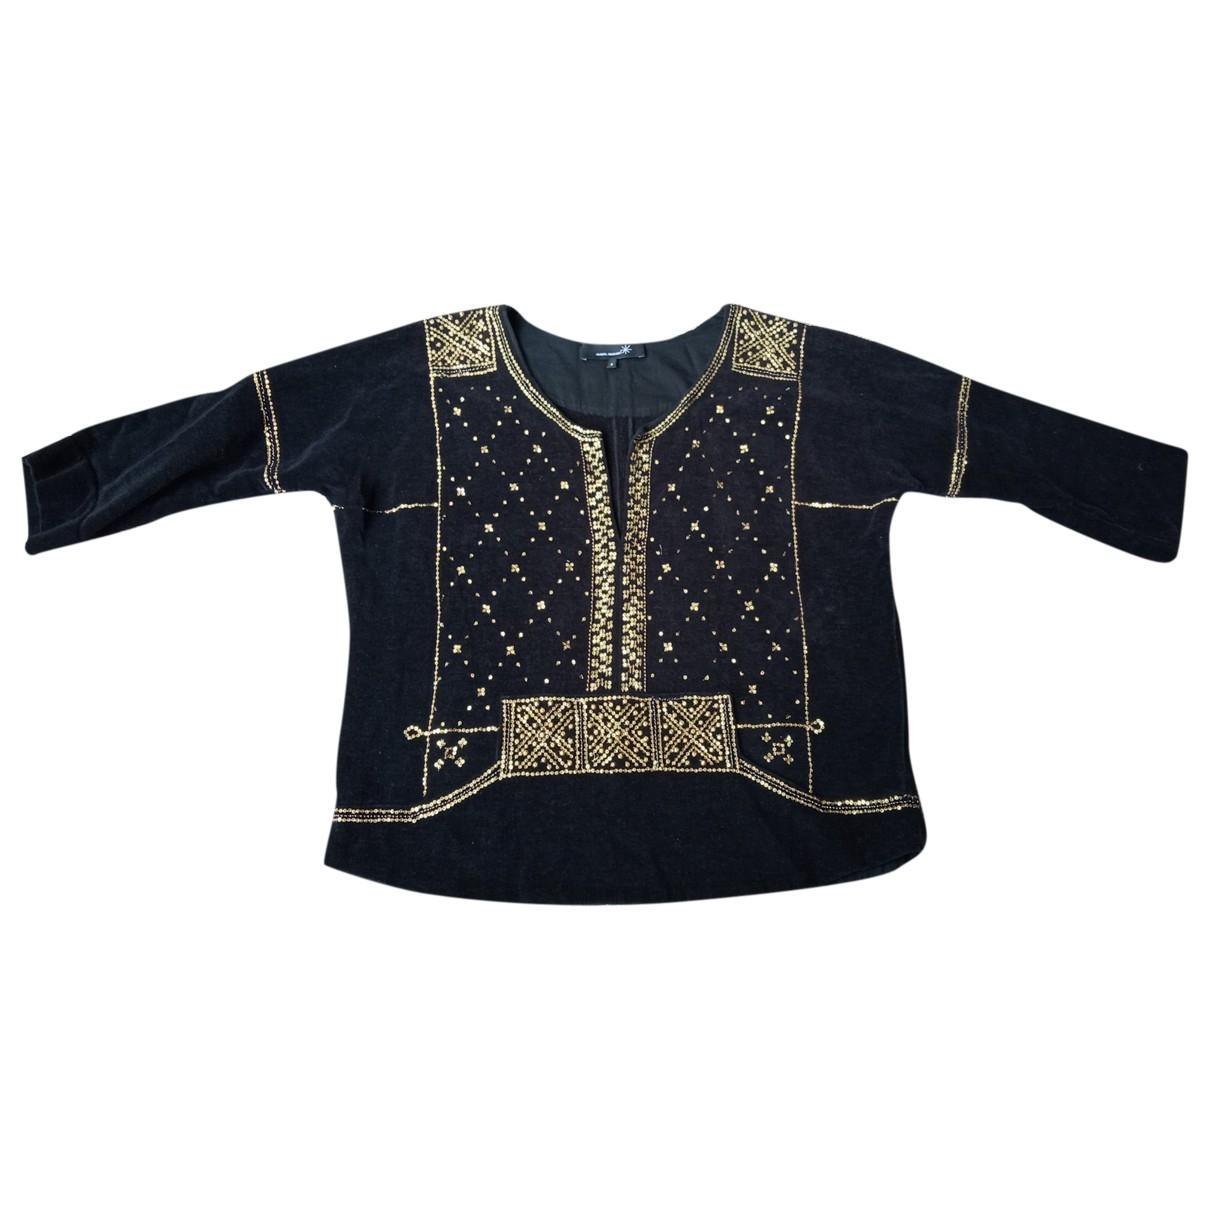 Isabel Marant \N Black Wool  top for Women 2 0-5